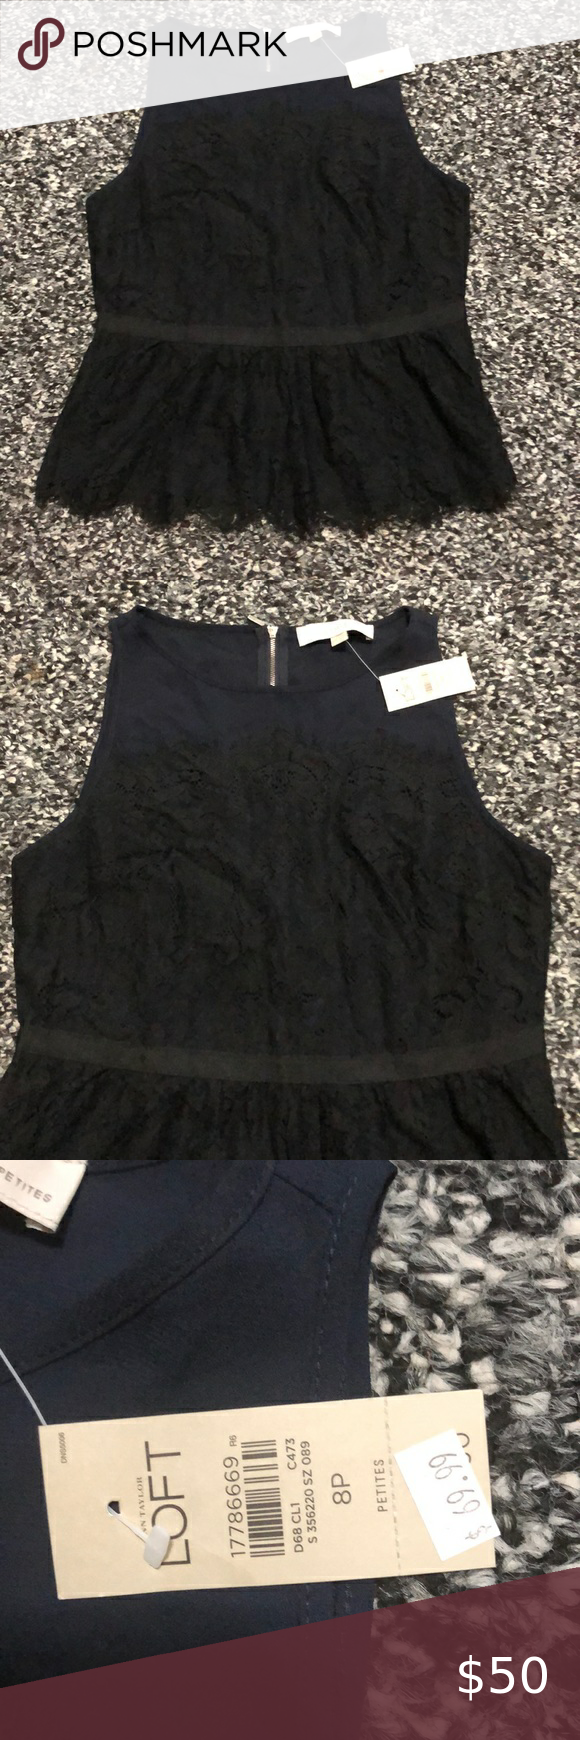 Loft Preplum Top Womens Knit Tops Lace Sleeveless Top Boho Printed Tops [ 1740 x 580 Pixel ]